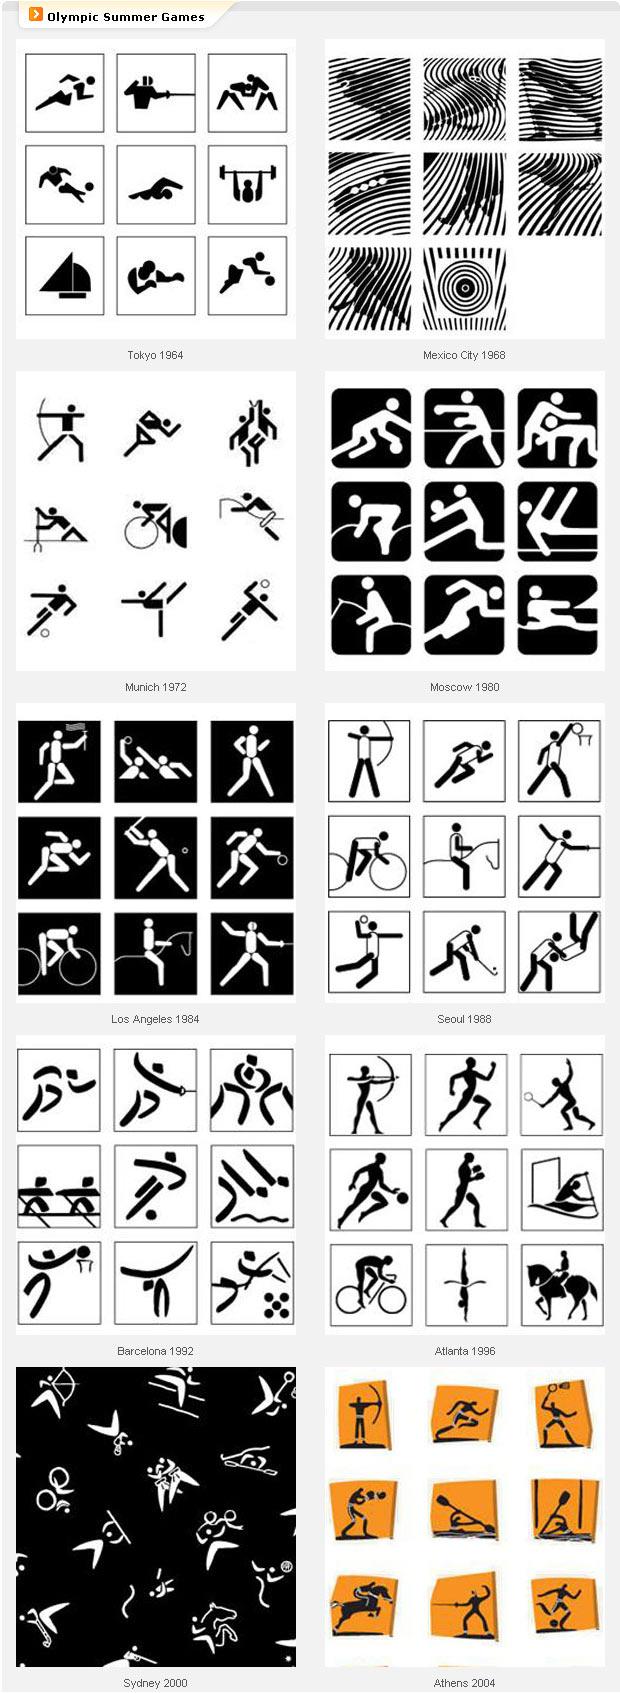 олимпиада года летняя